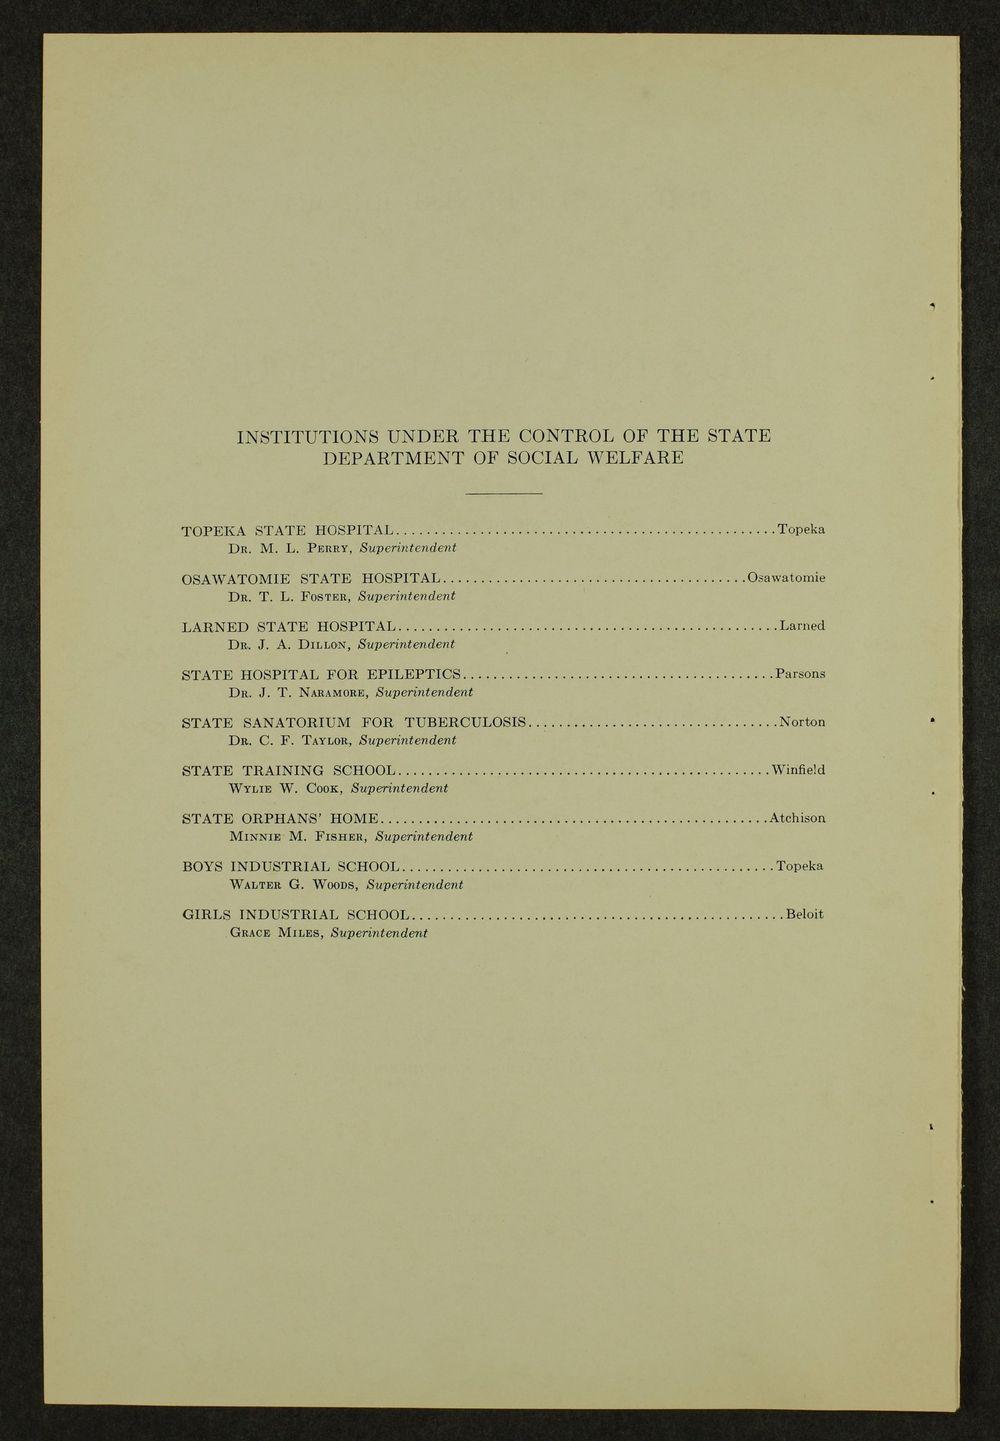 Biennial report of the Boys Industrial School, 1940 - 2